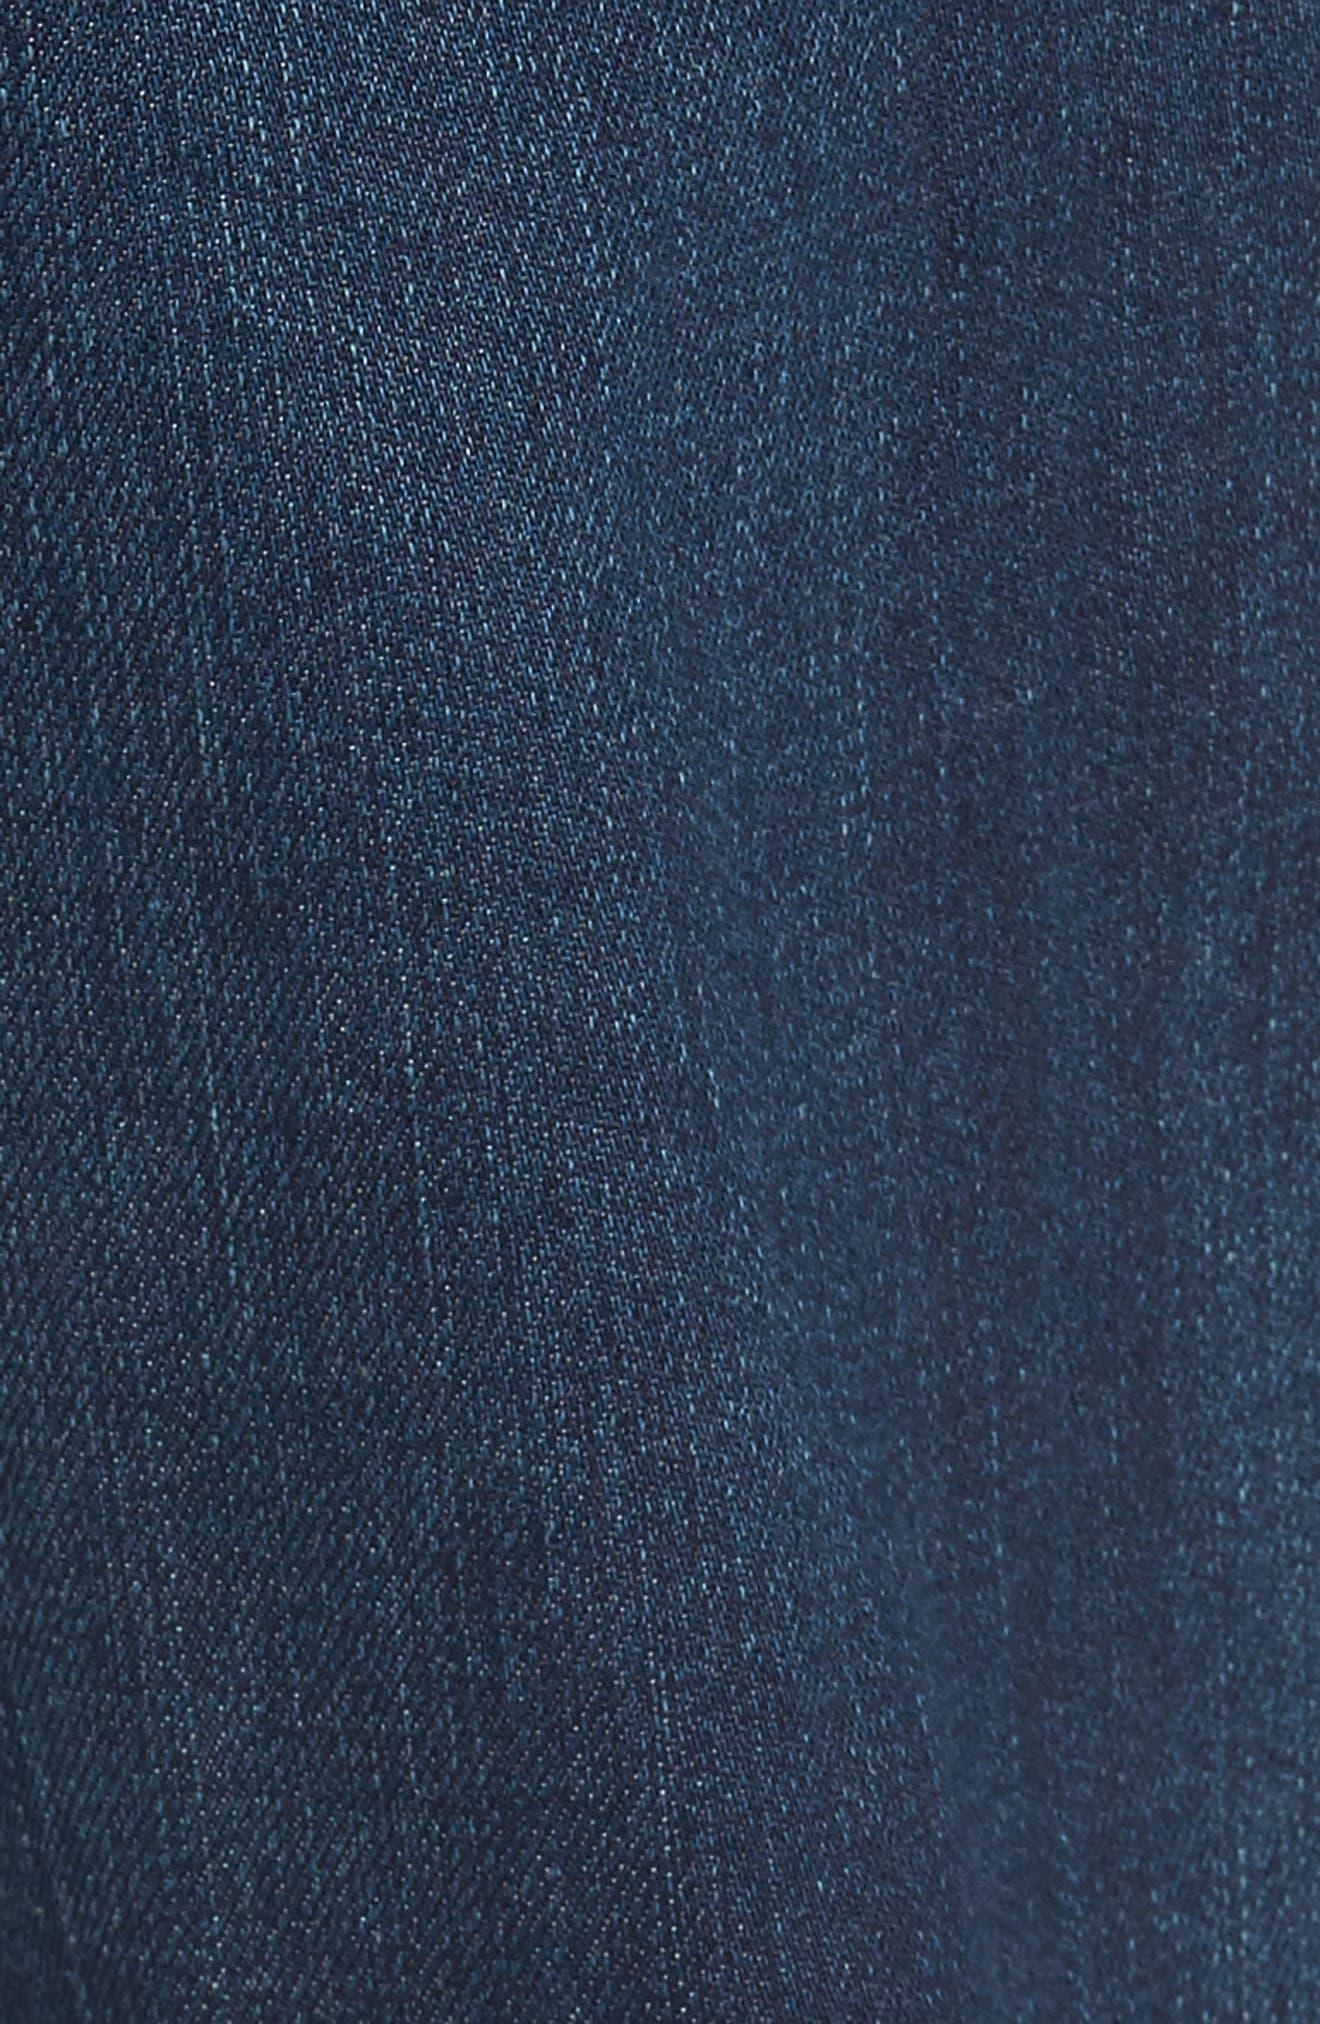 Graduate Slim Straight Fit Jeans,                             Alternate thumbnail 5, color,                             482